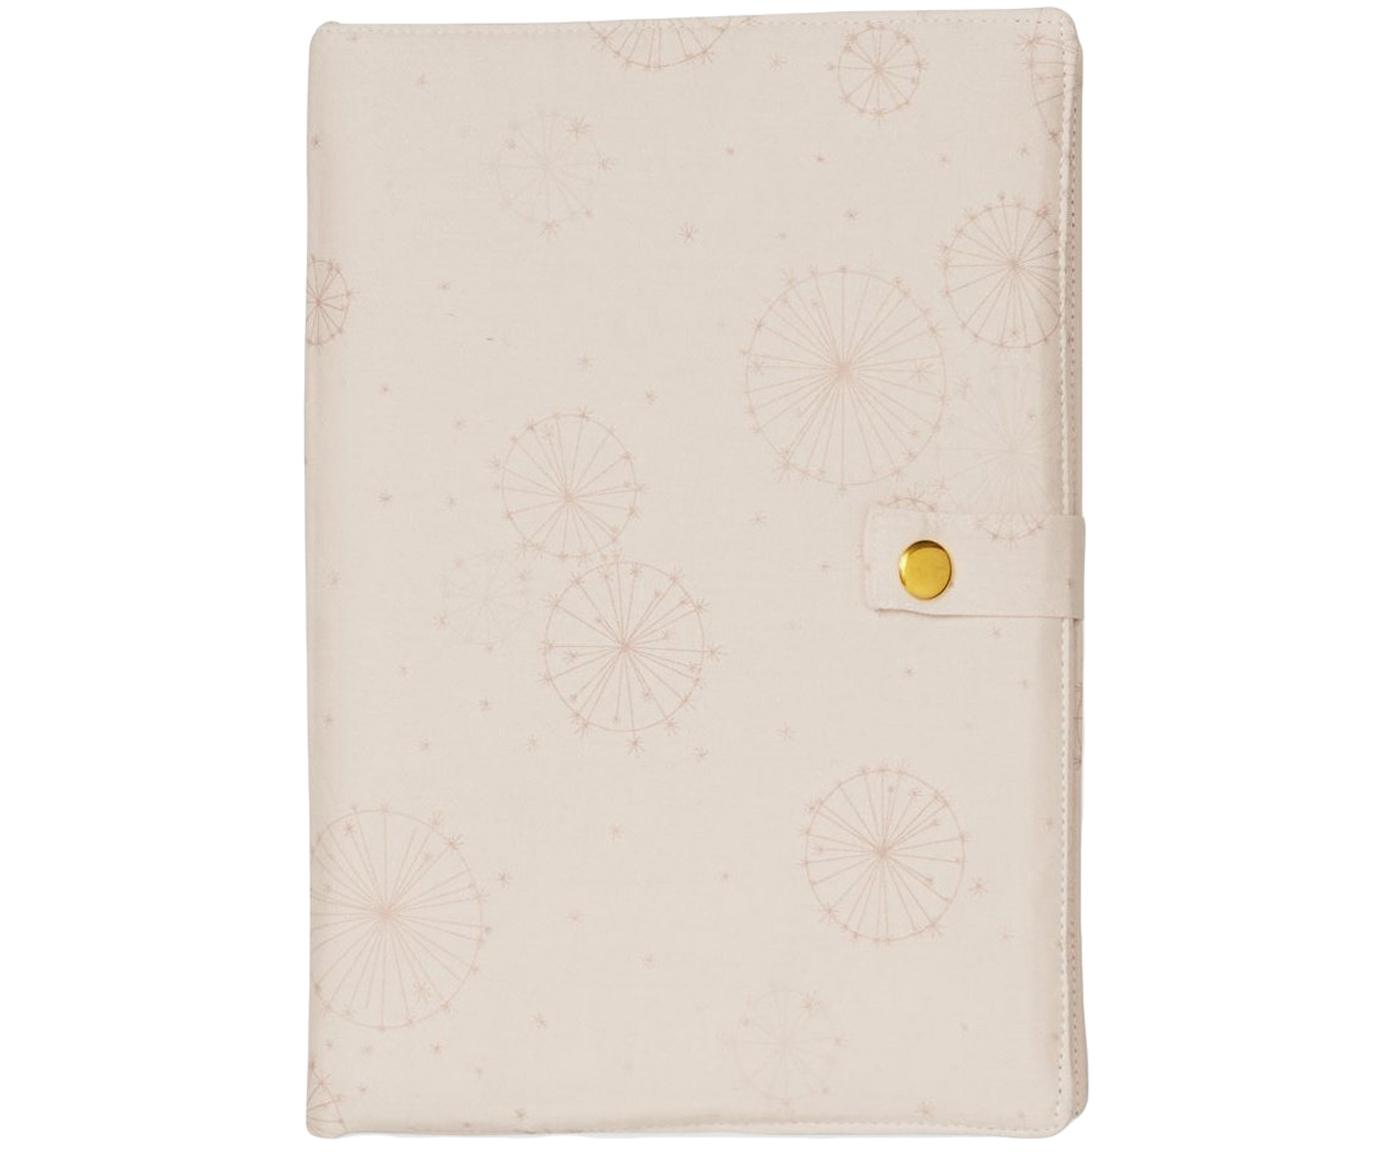 Funda para agenda de algodón ecológico Dandelion, Algodón ecológico, certificado OCS, Rosa, An 17 x Al 24 cm